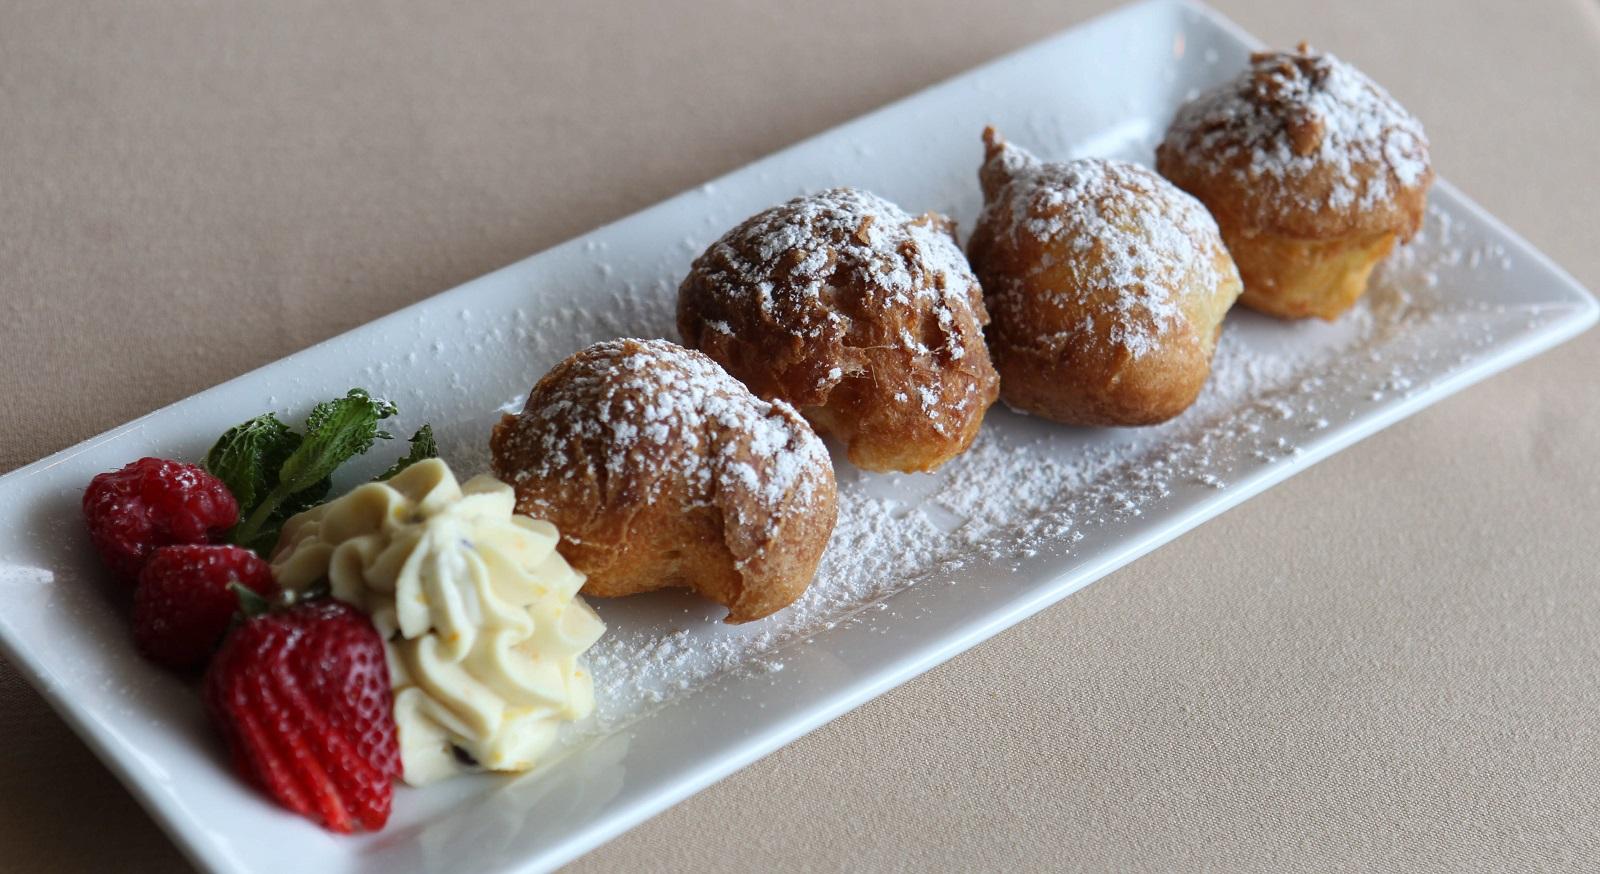 Sfinge is a popular dessert for St. Joseph's Day. This is Gigi's Cucina Povera's creation. (Sharon Cantillon/Buffalo News file photo)